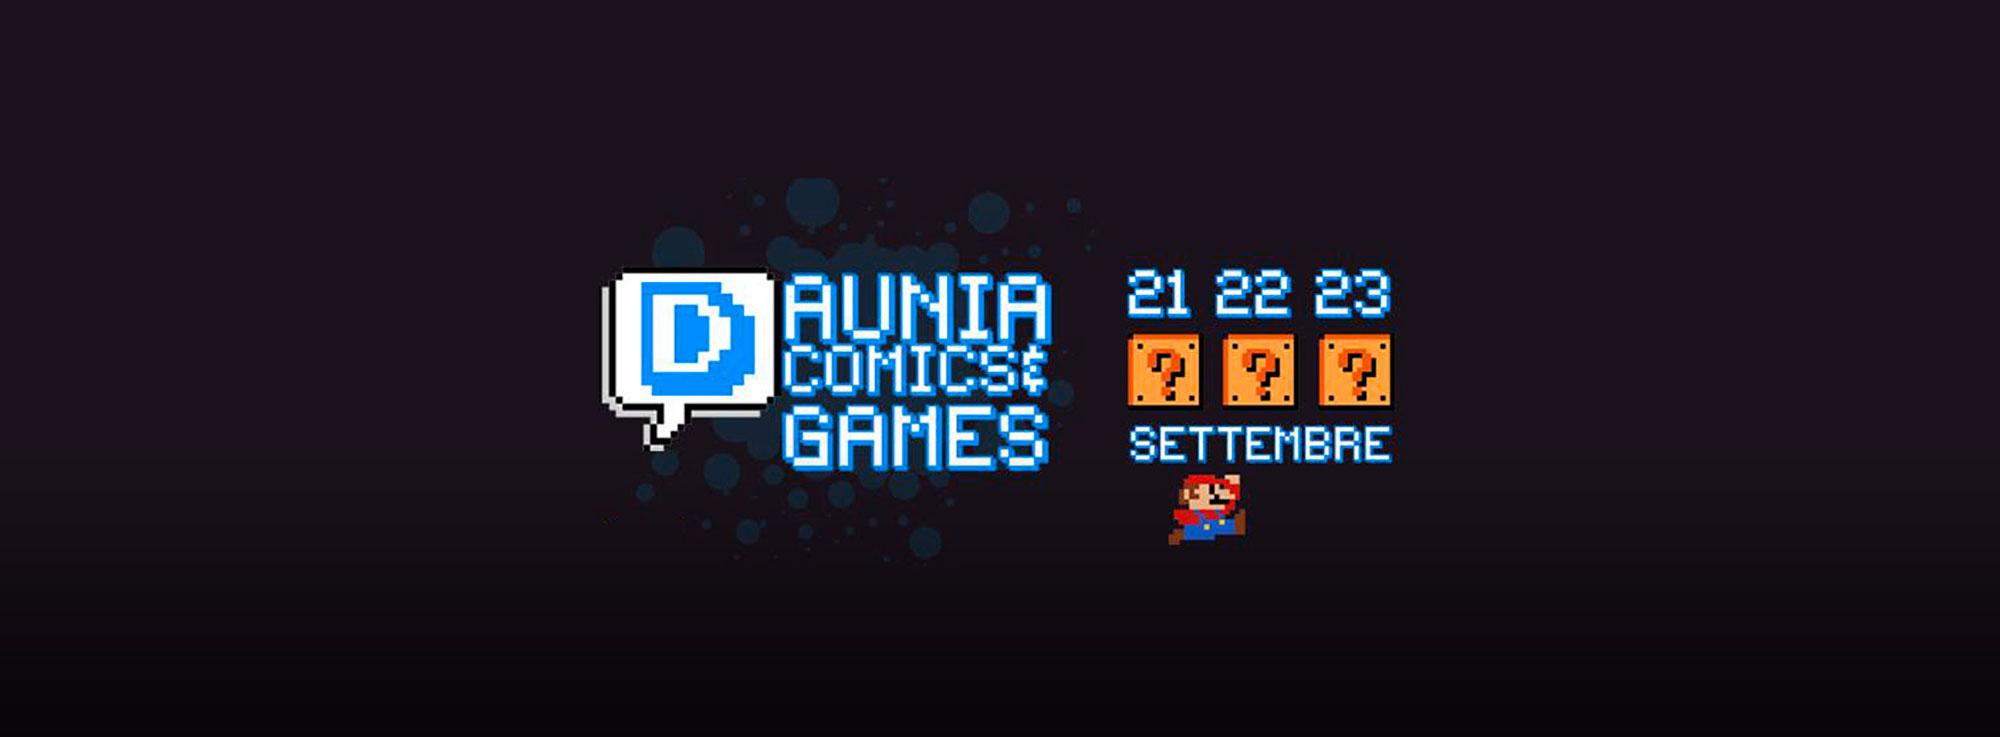 Foggia: Daunia Comics & Games